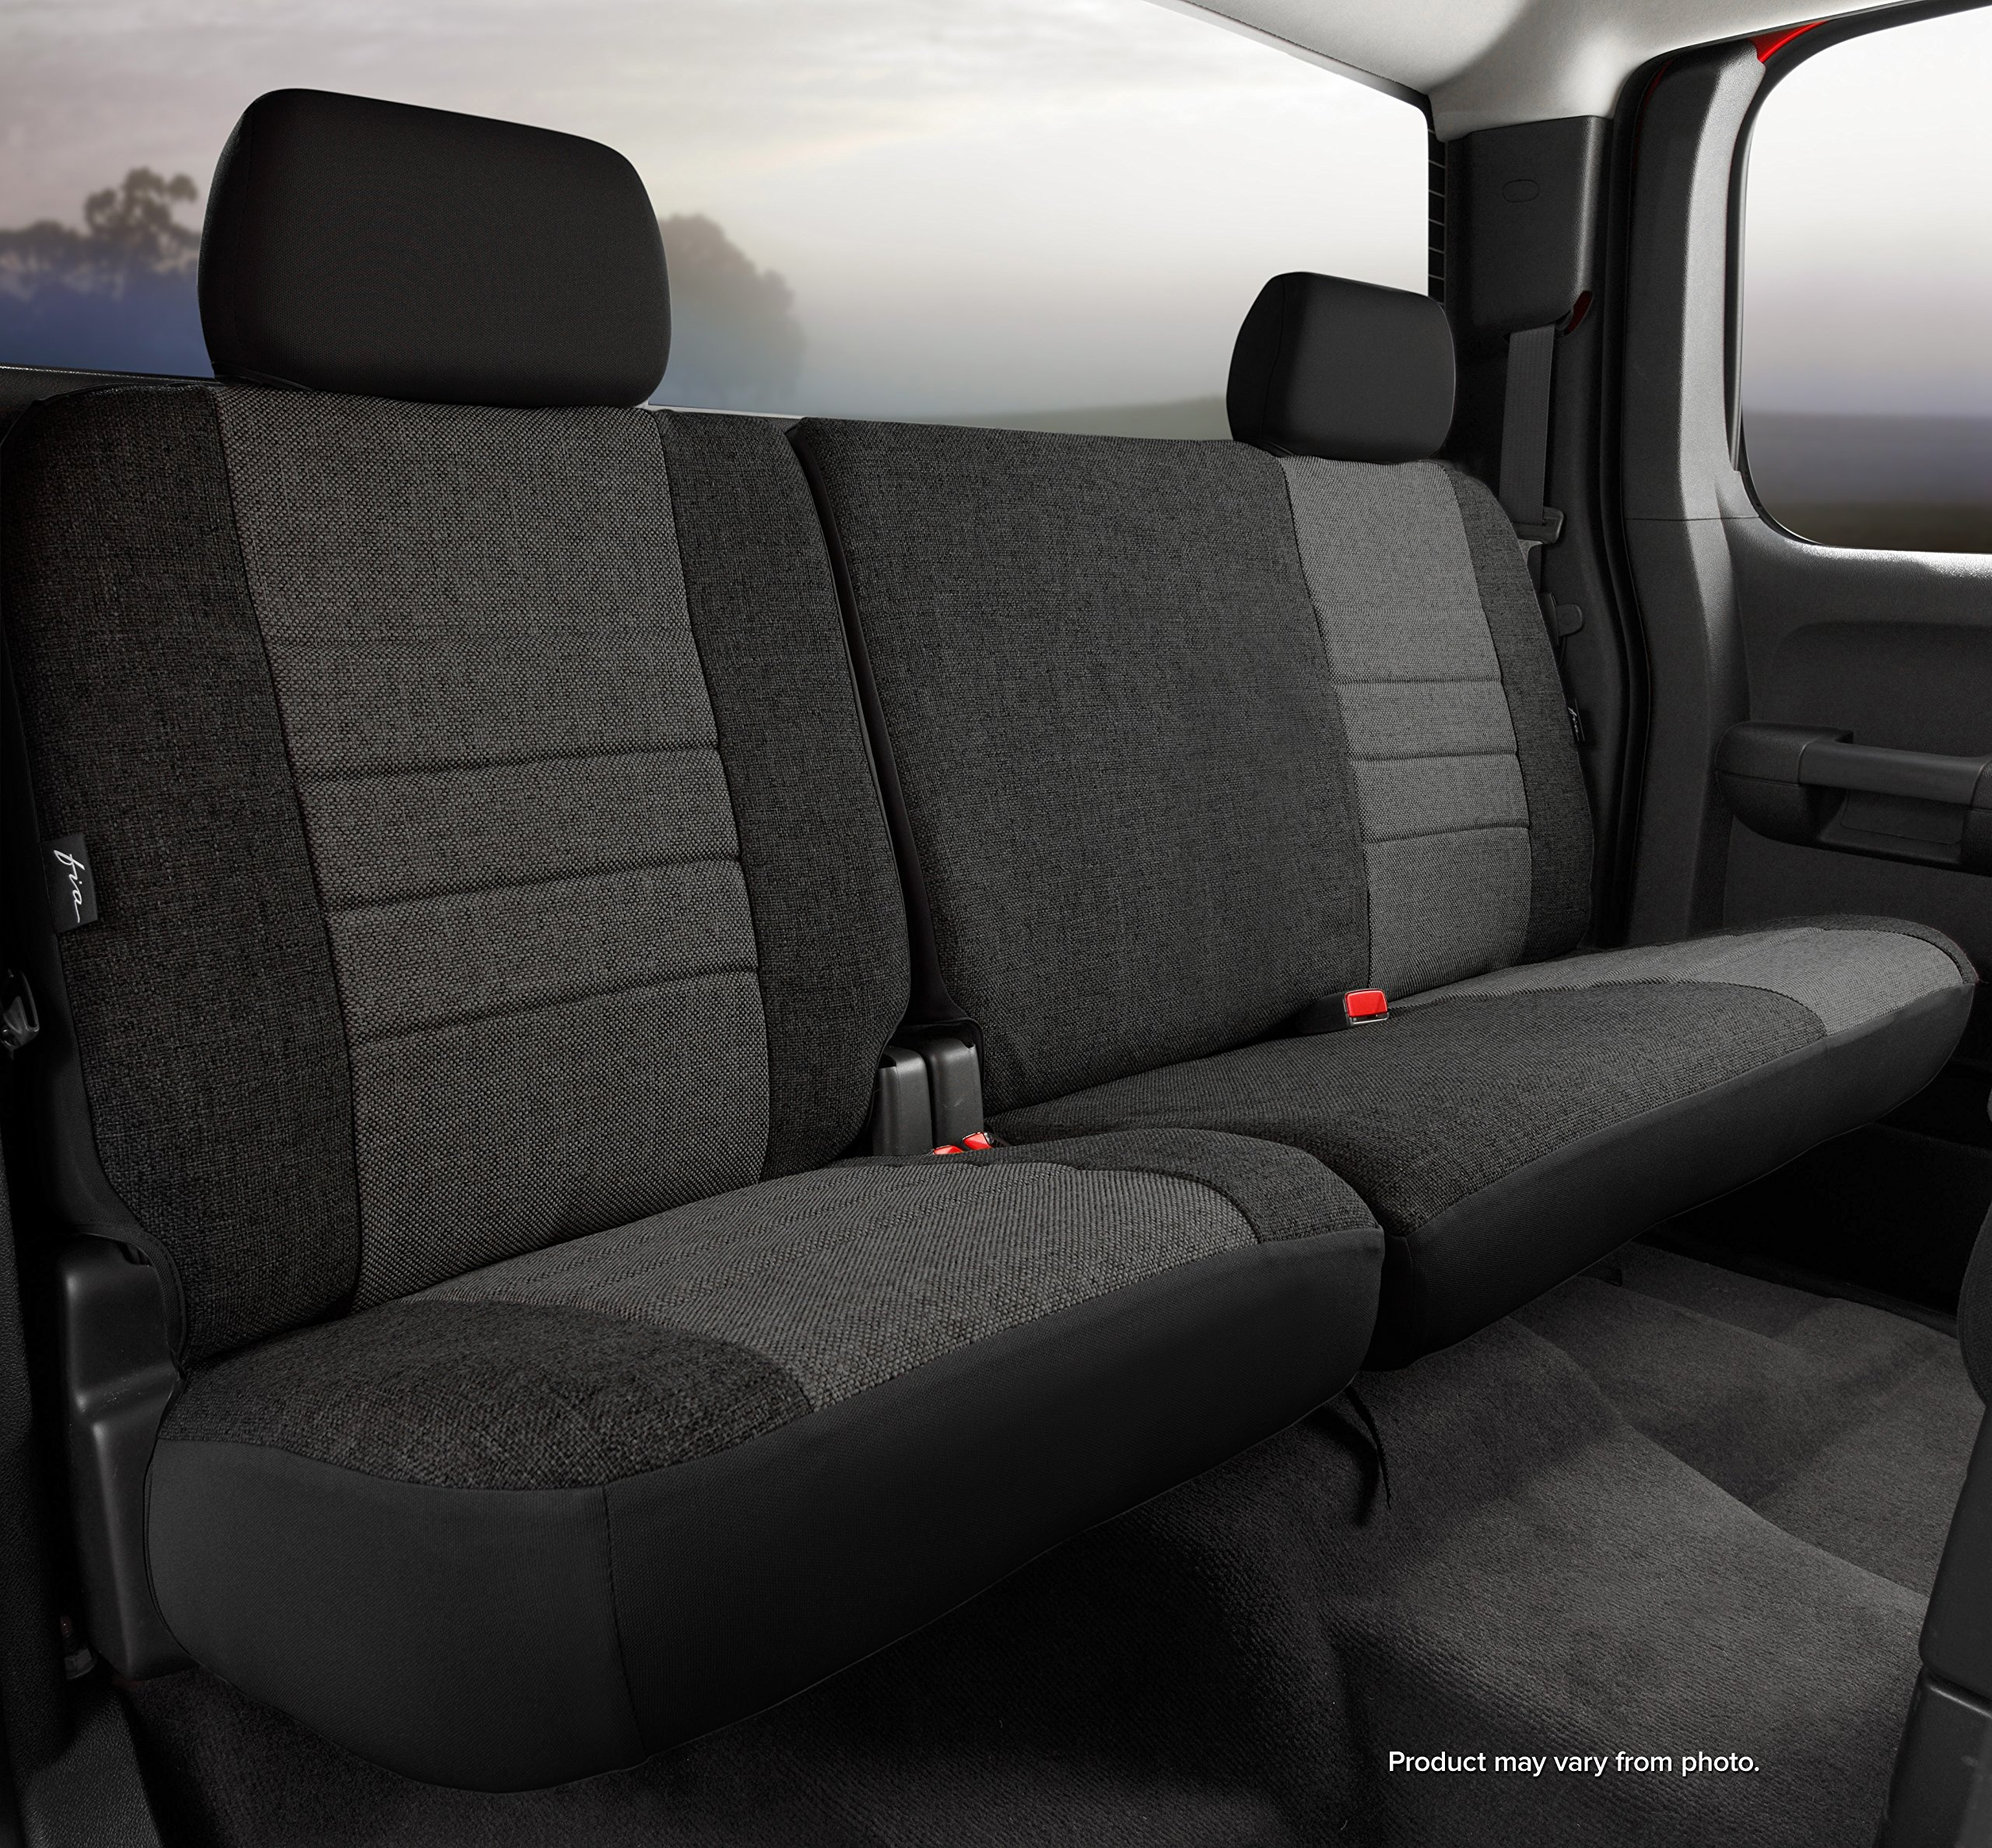 Fia OE32-38 CHARC Custom Fit Rear Seat Cover Split Seat 60/40  - Tweed (Charcoal)